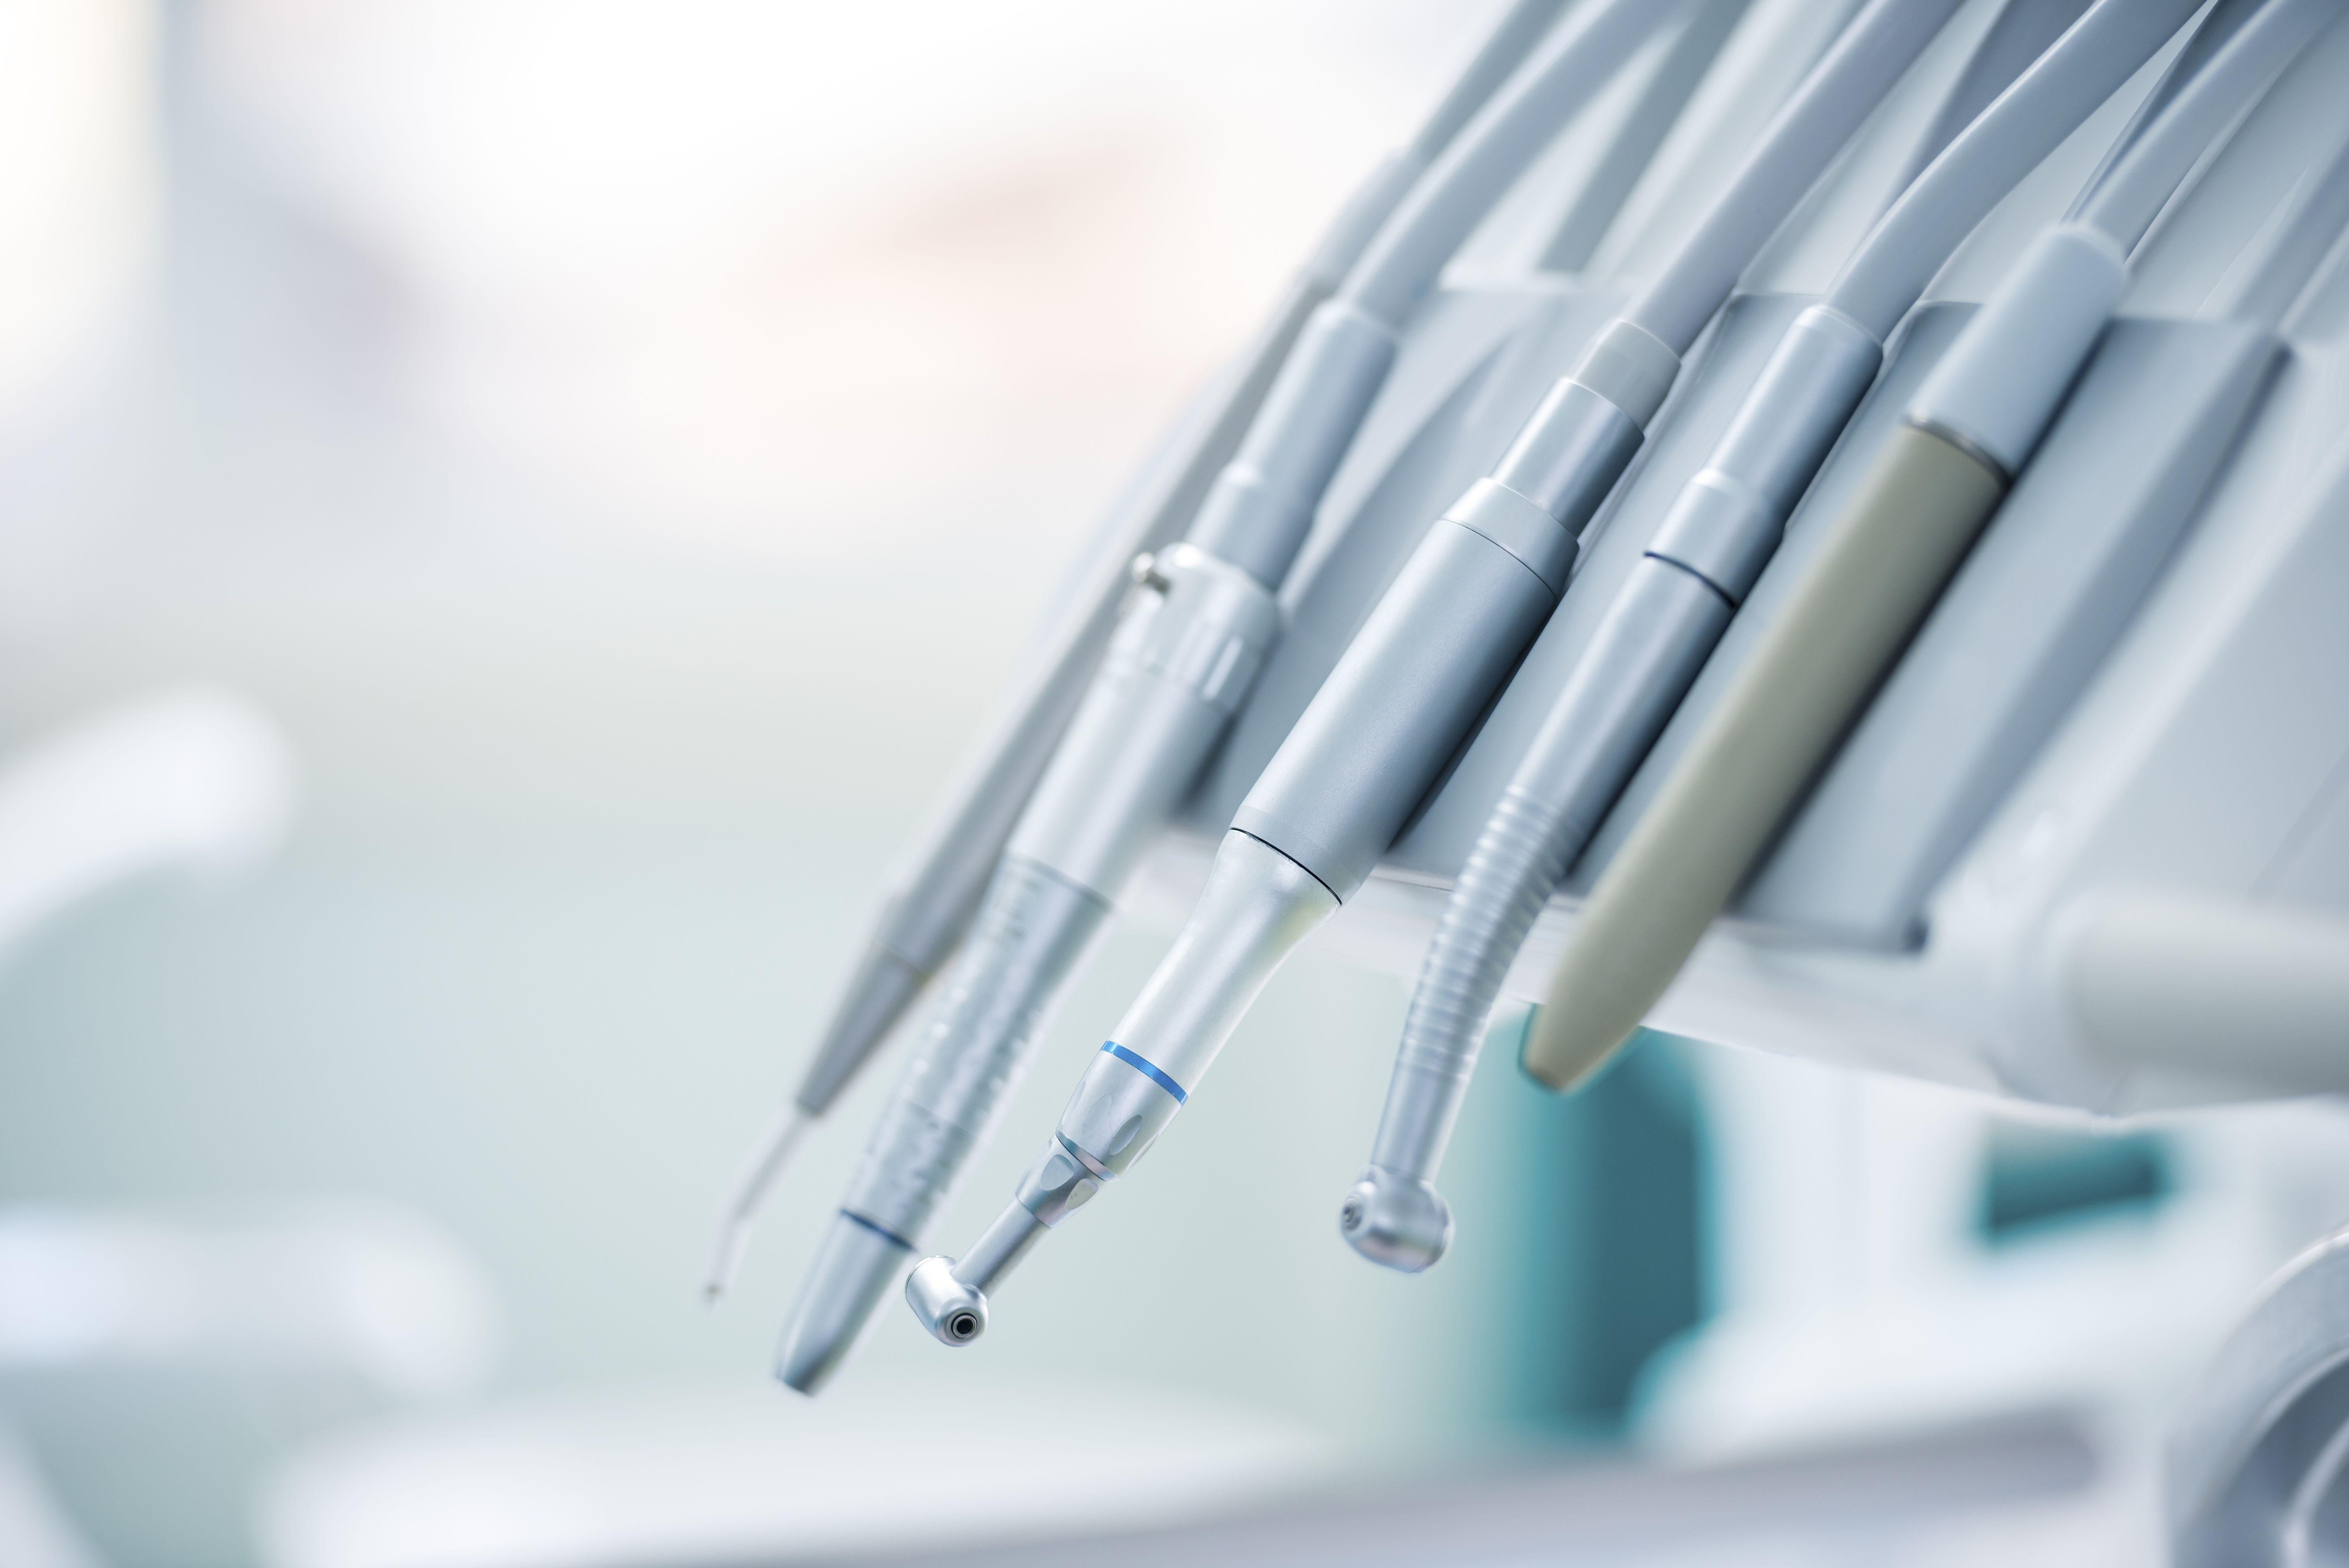 Clínicas dentales en Hospitalet de Llobregat